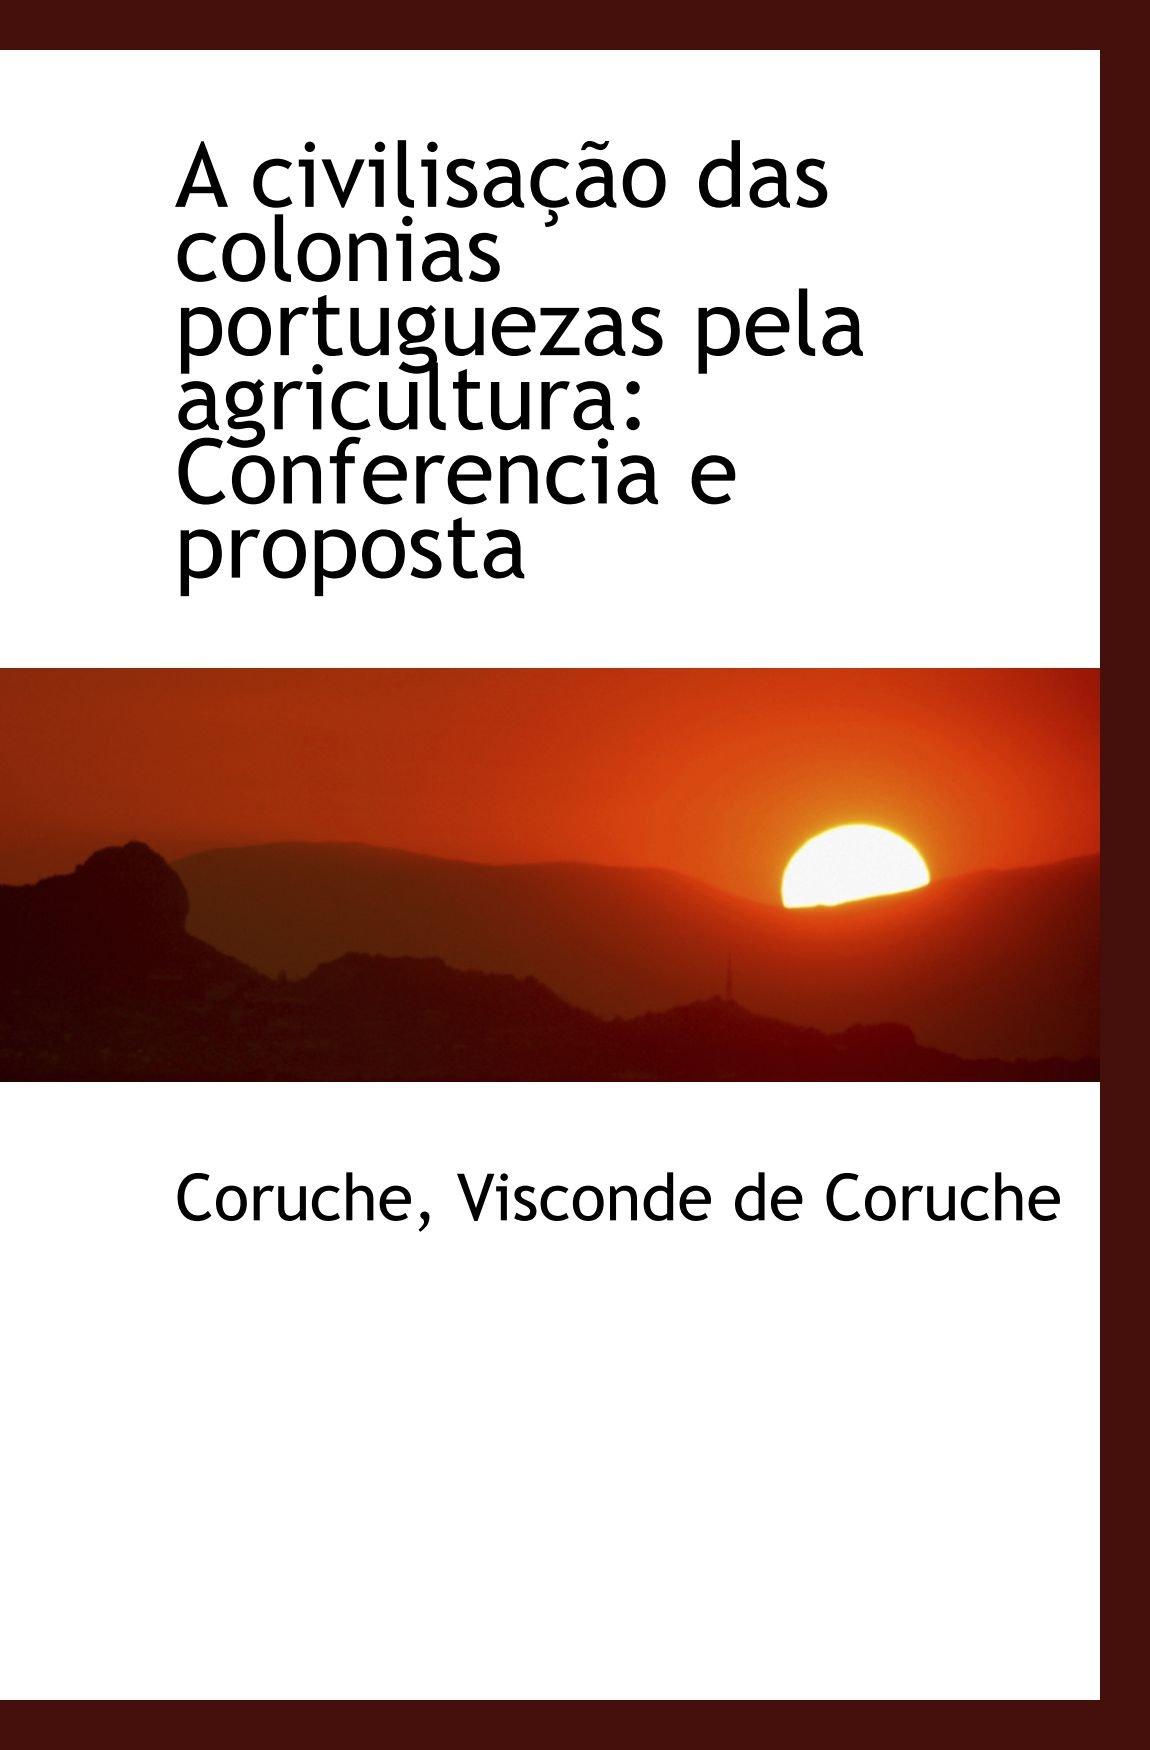 A civilisação das colonias portuguezas pela agricultura: Conferencia e proposta: Amazon.es: Coruche, Visconde de Coruche: Libros en idiomas extranjeros